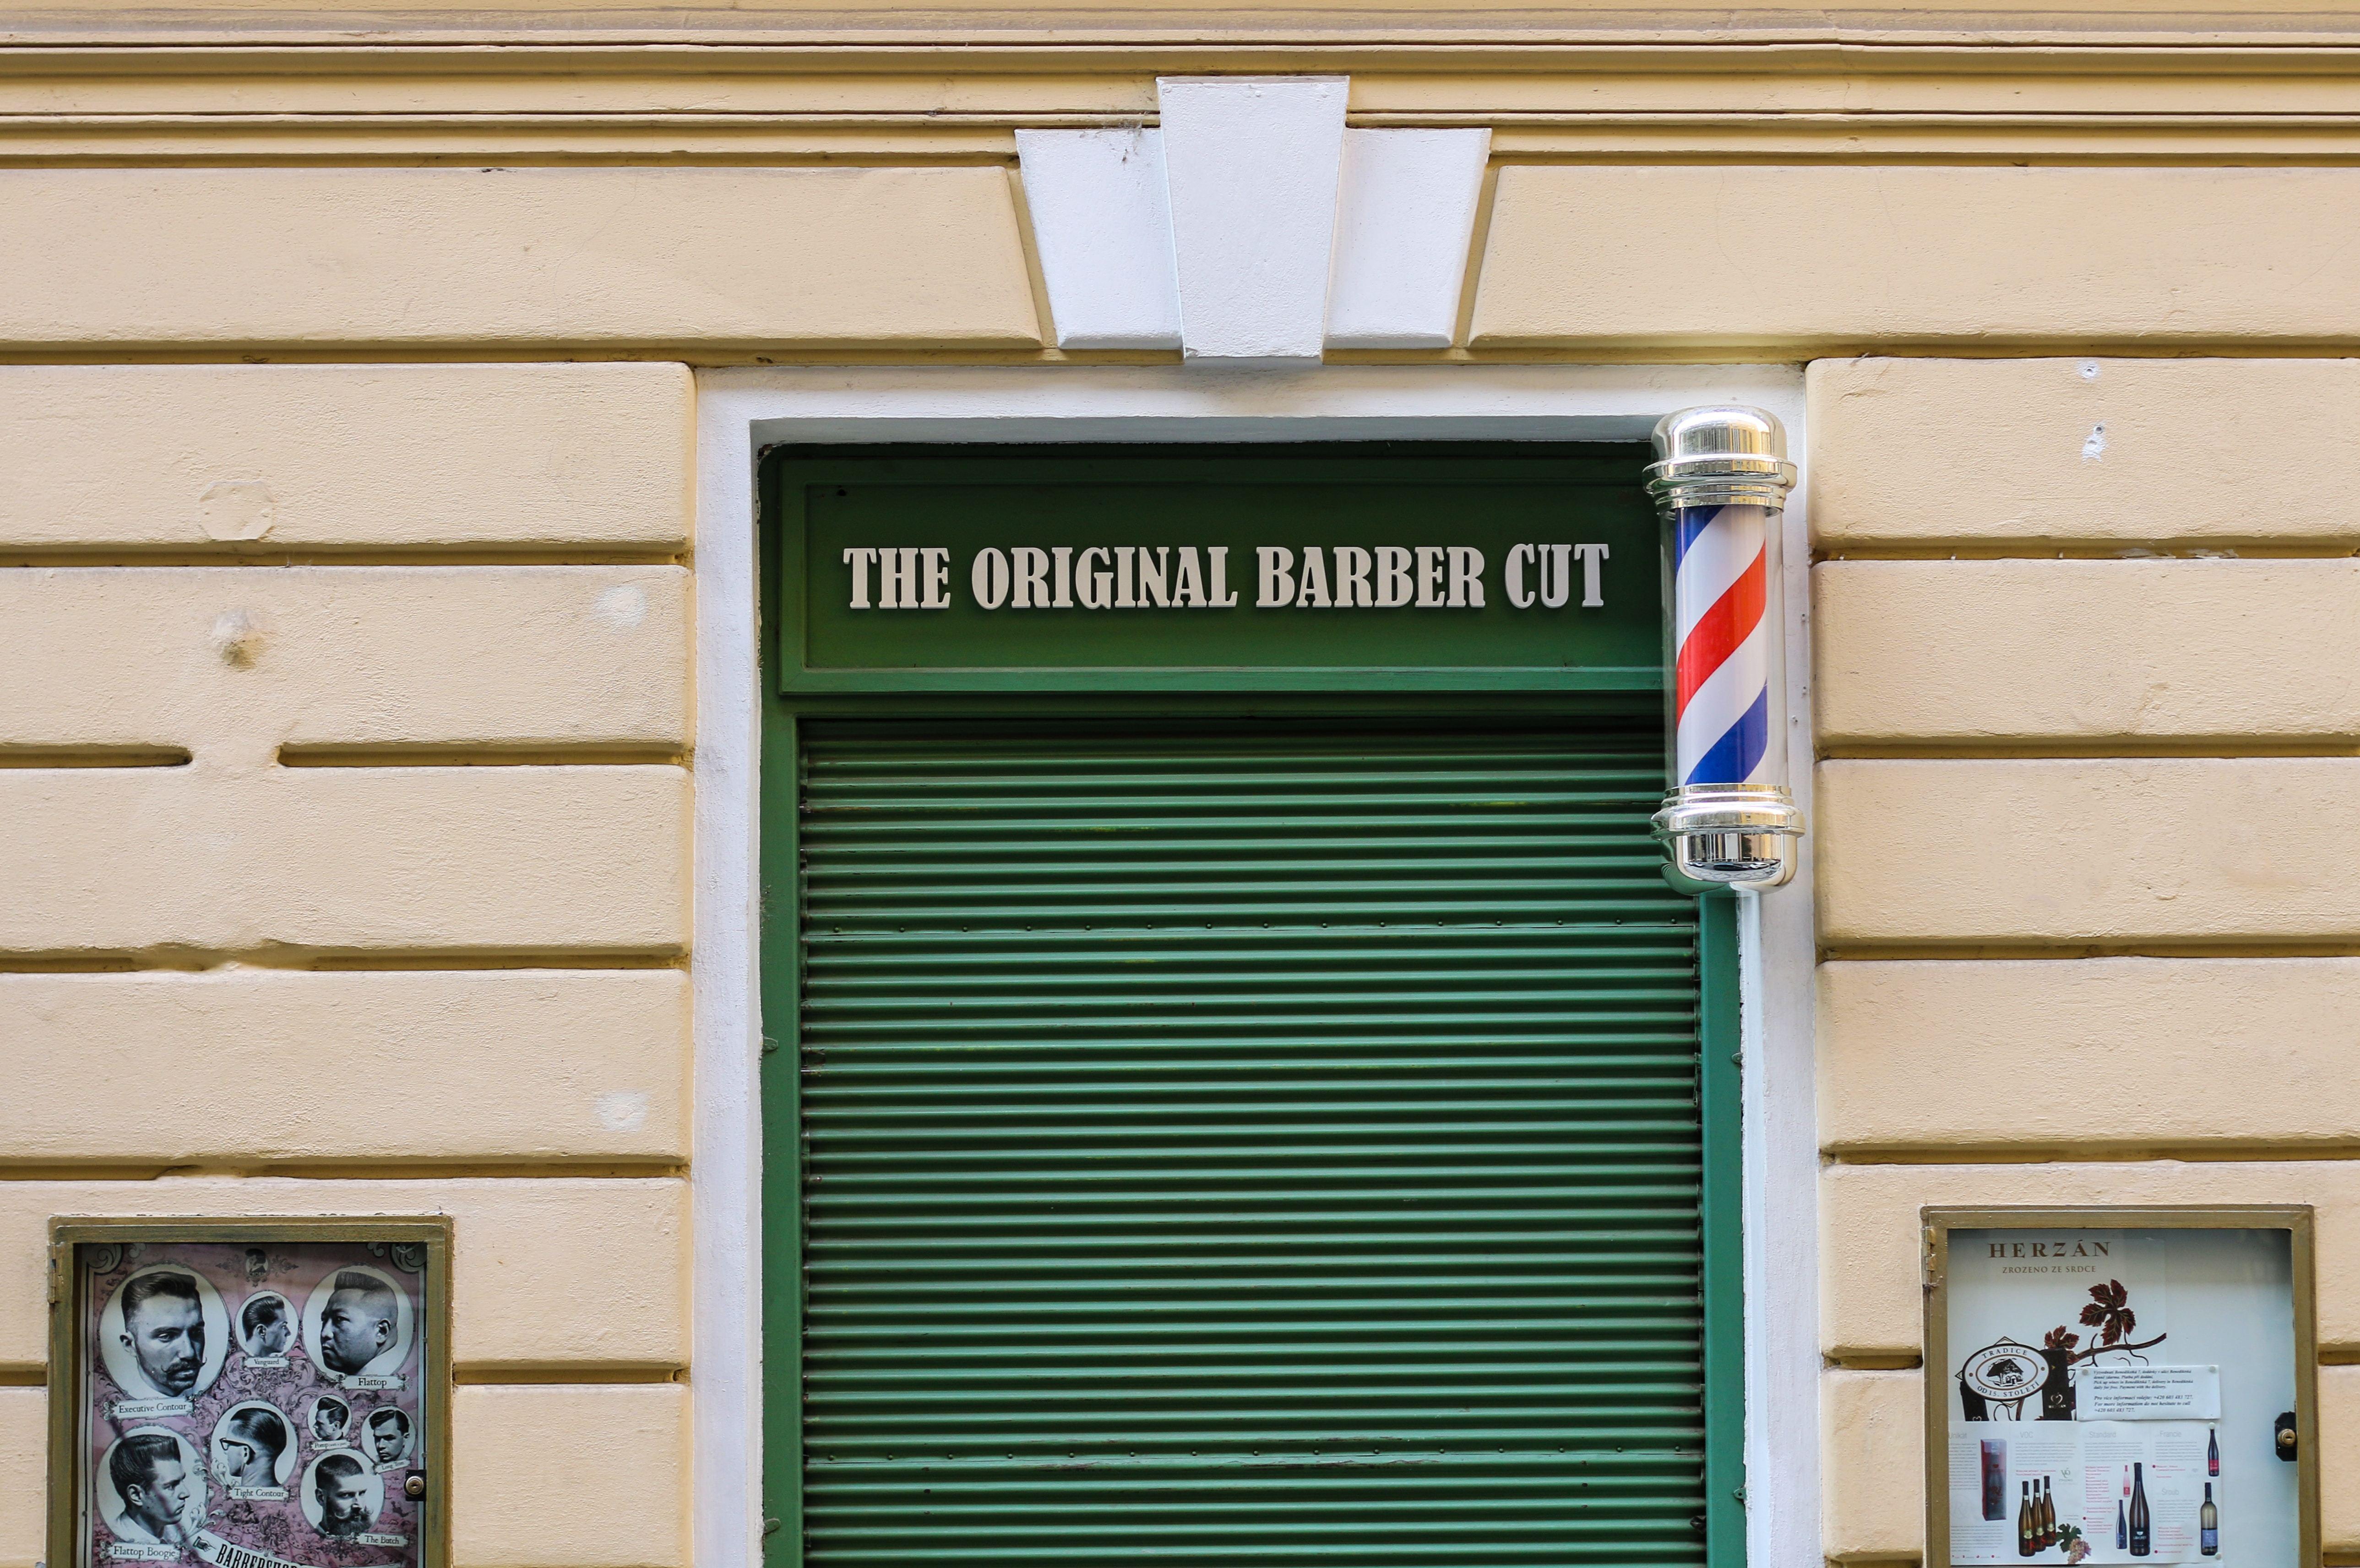 Barber Aupb2Mwnrpo